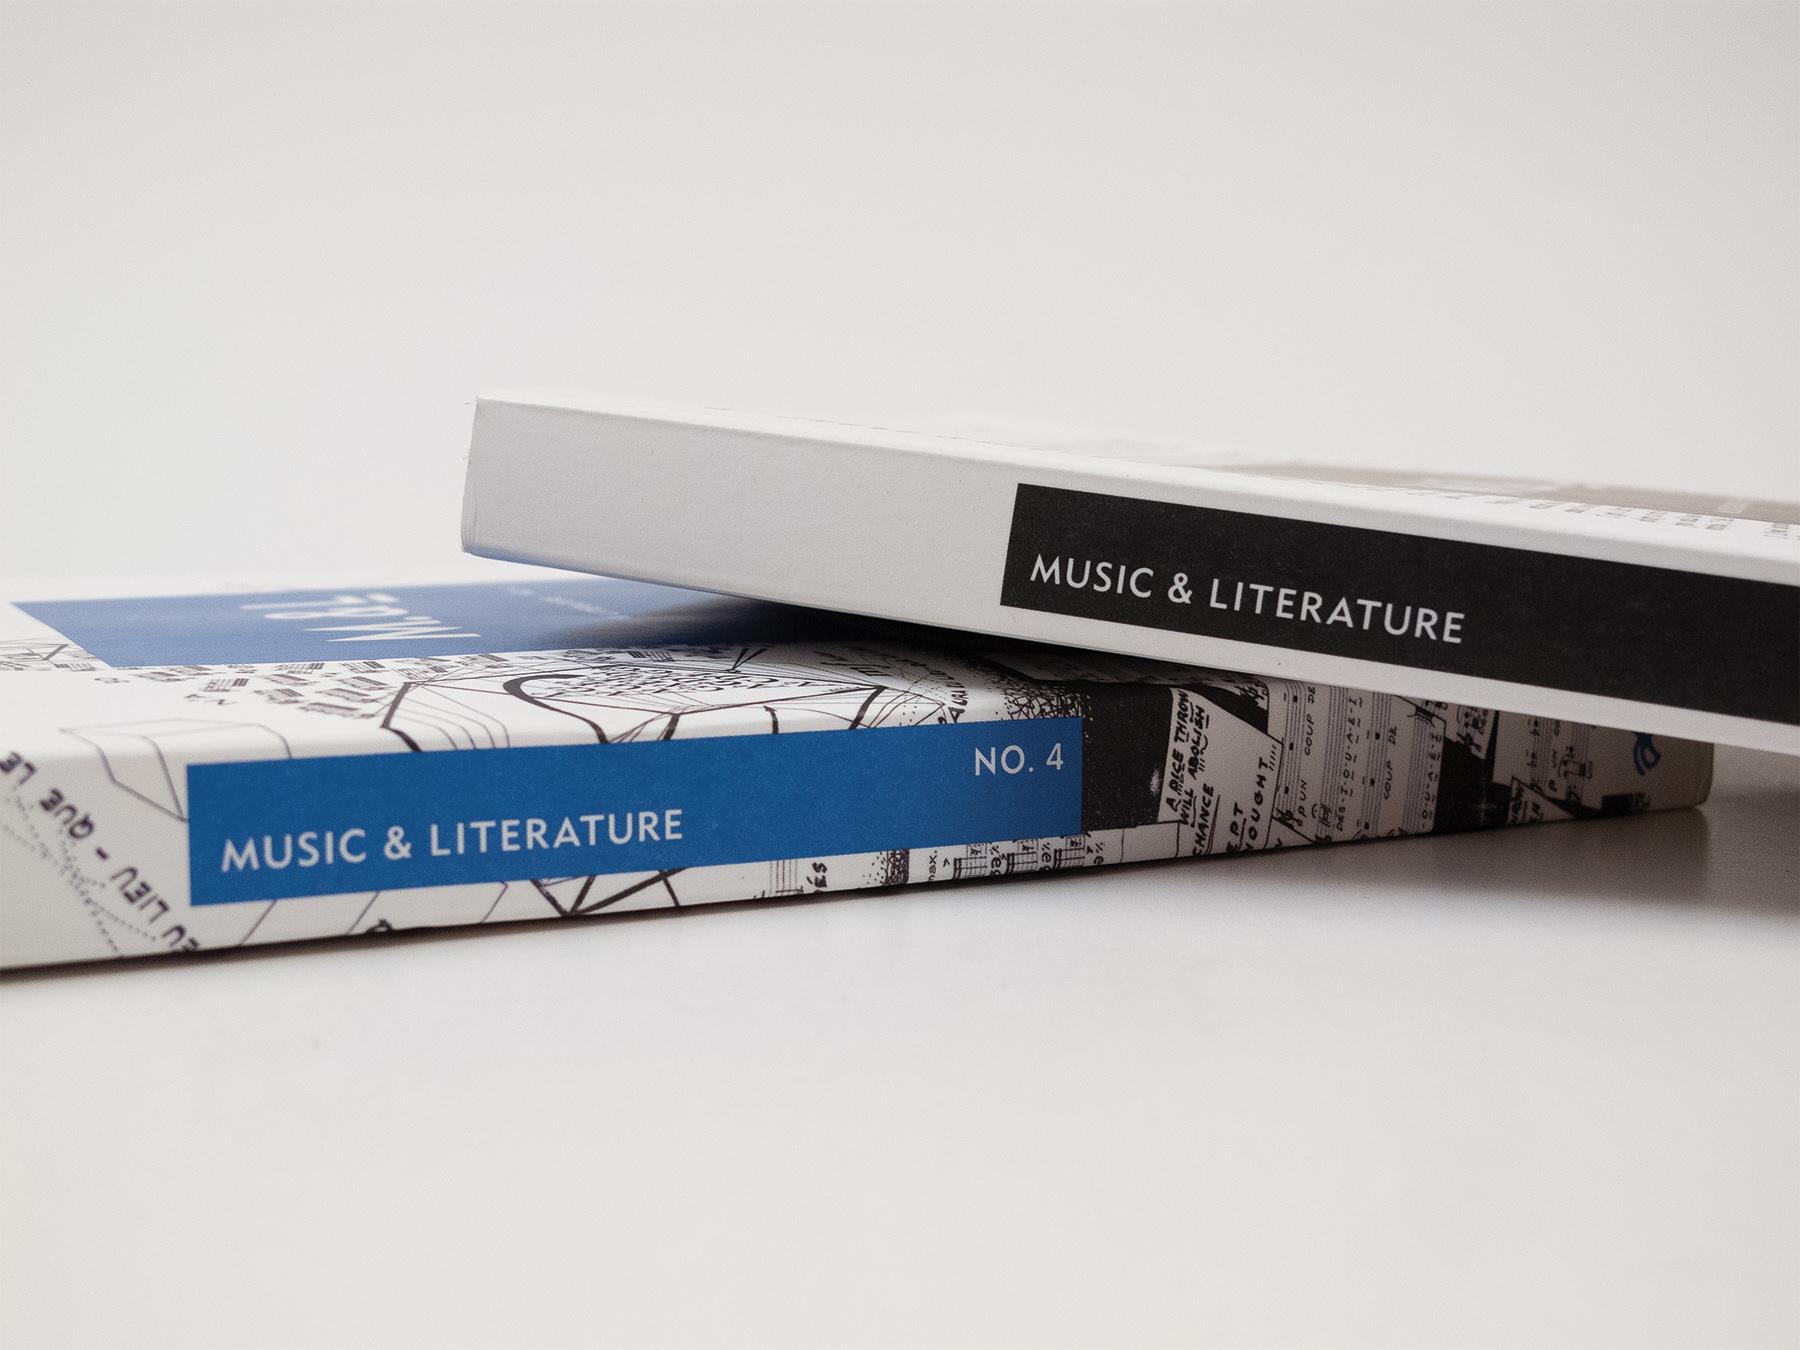 Music & Literature Visual Identity